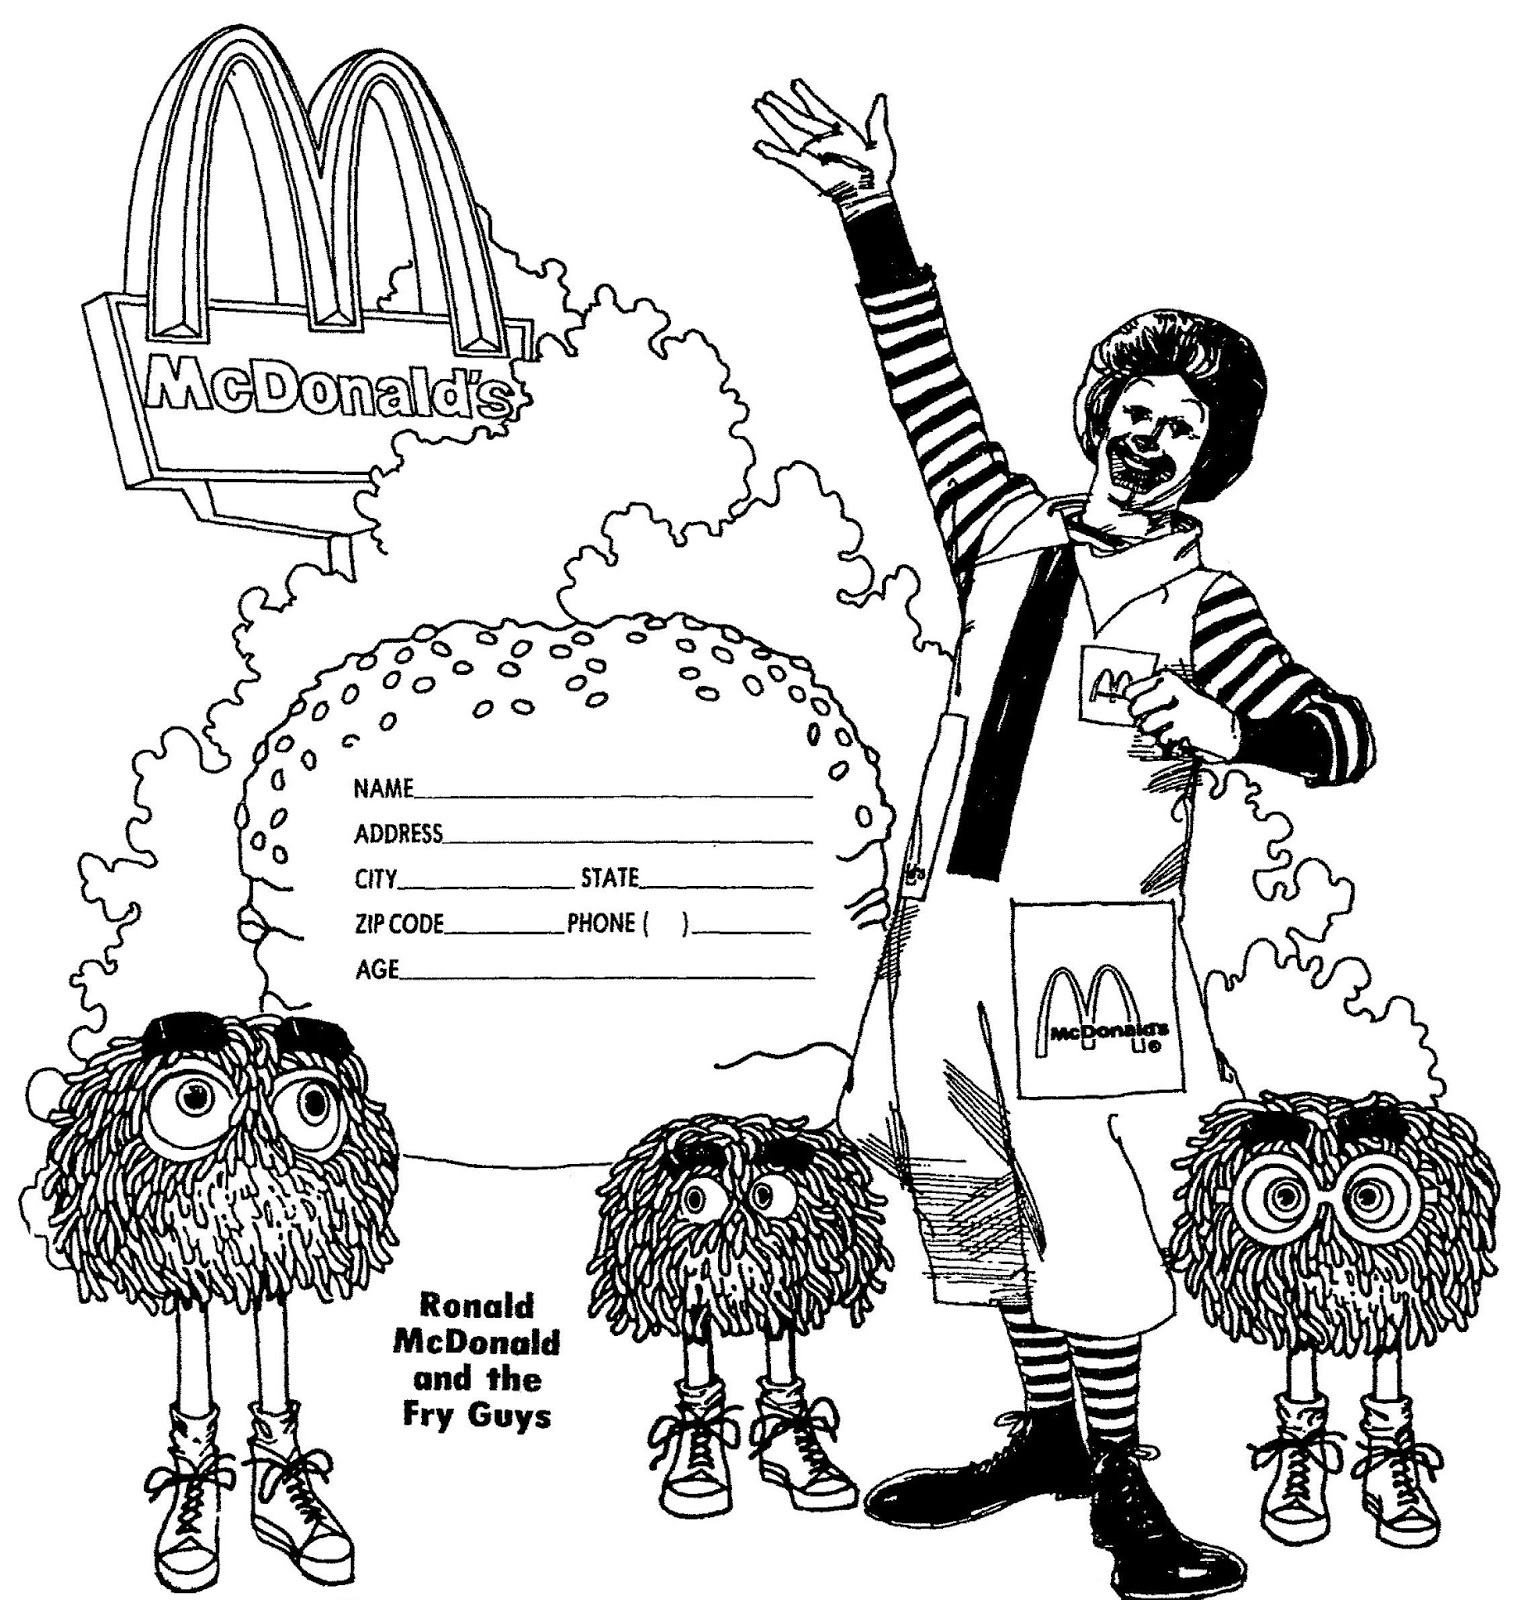 image  ronald mcdonald coloring paper  mcdonald's